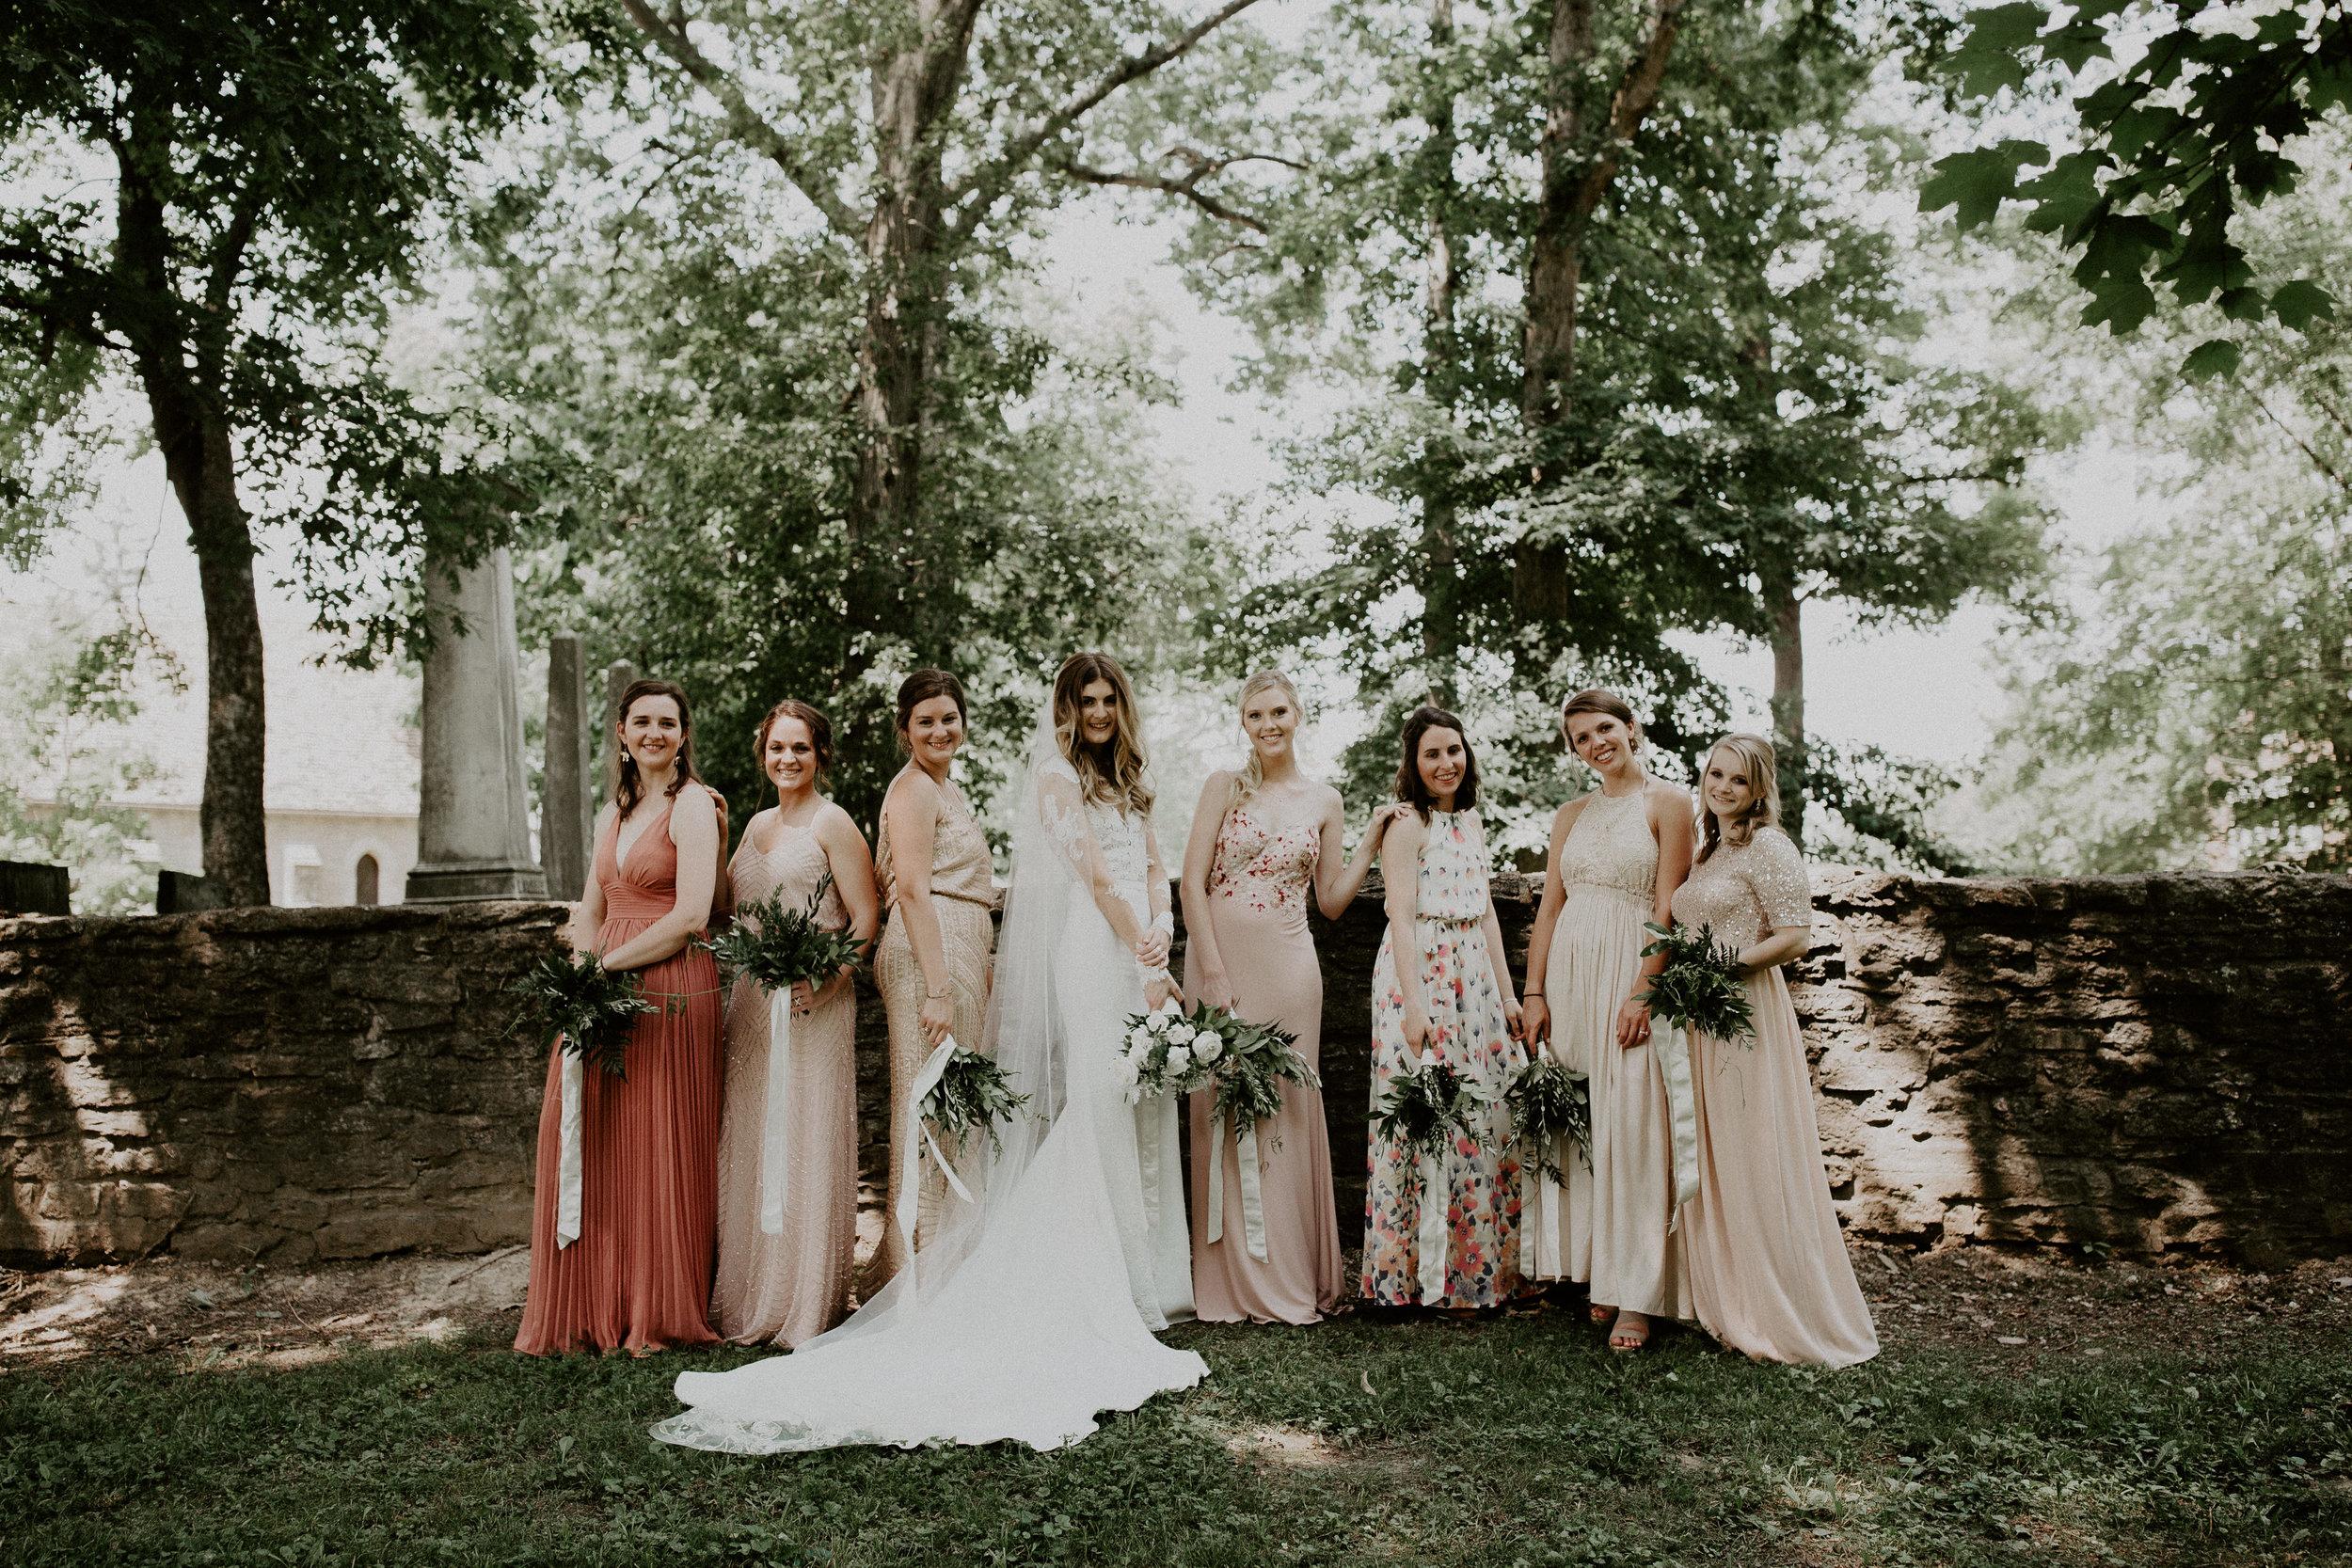 Mariemont_Chapel_Cincinnati_Wedding_Hannah_Nick-EDIT-269.JPG